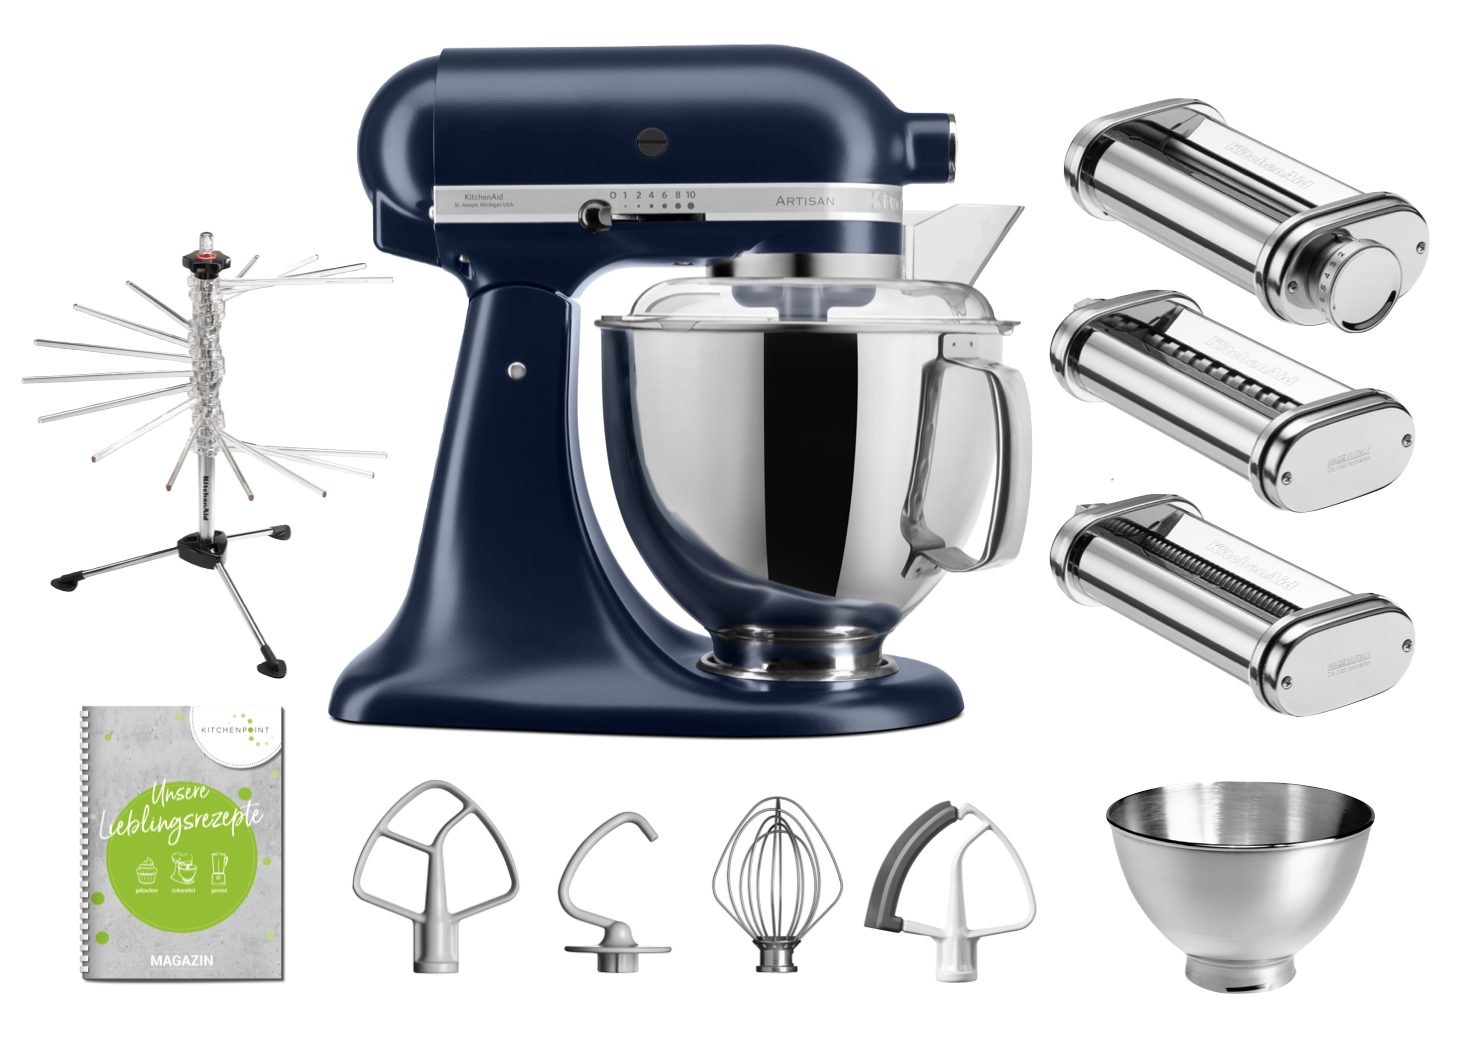 KitchenAid Küchenmaschine 175 - Pasta Set Tintenblau